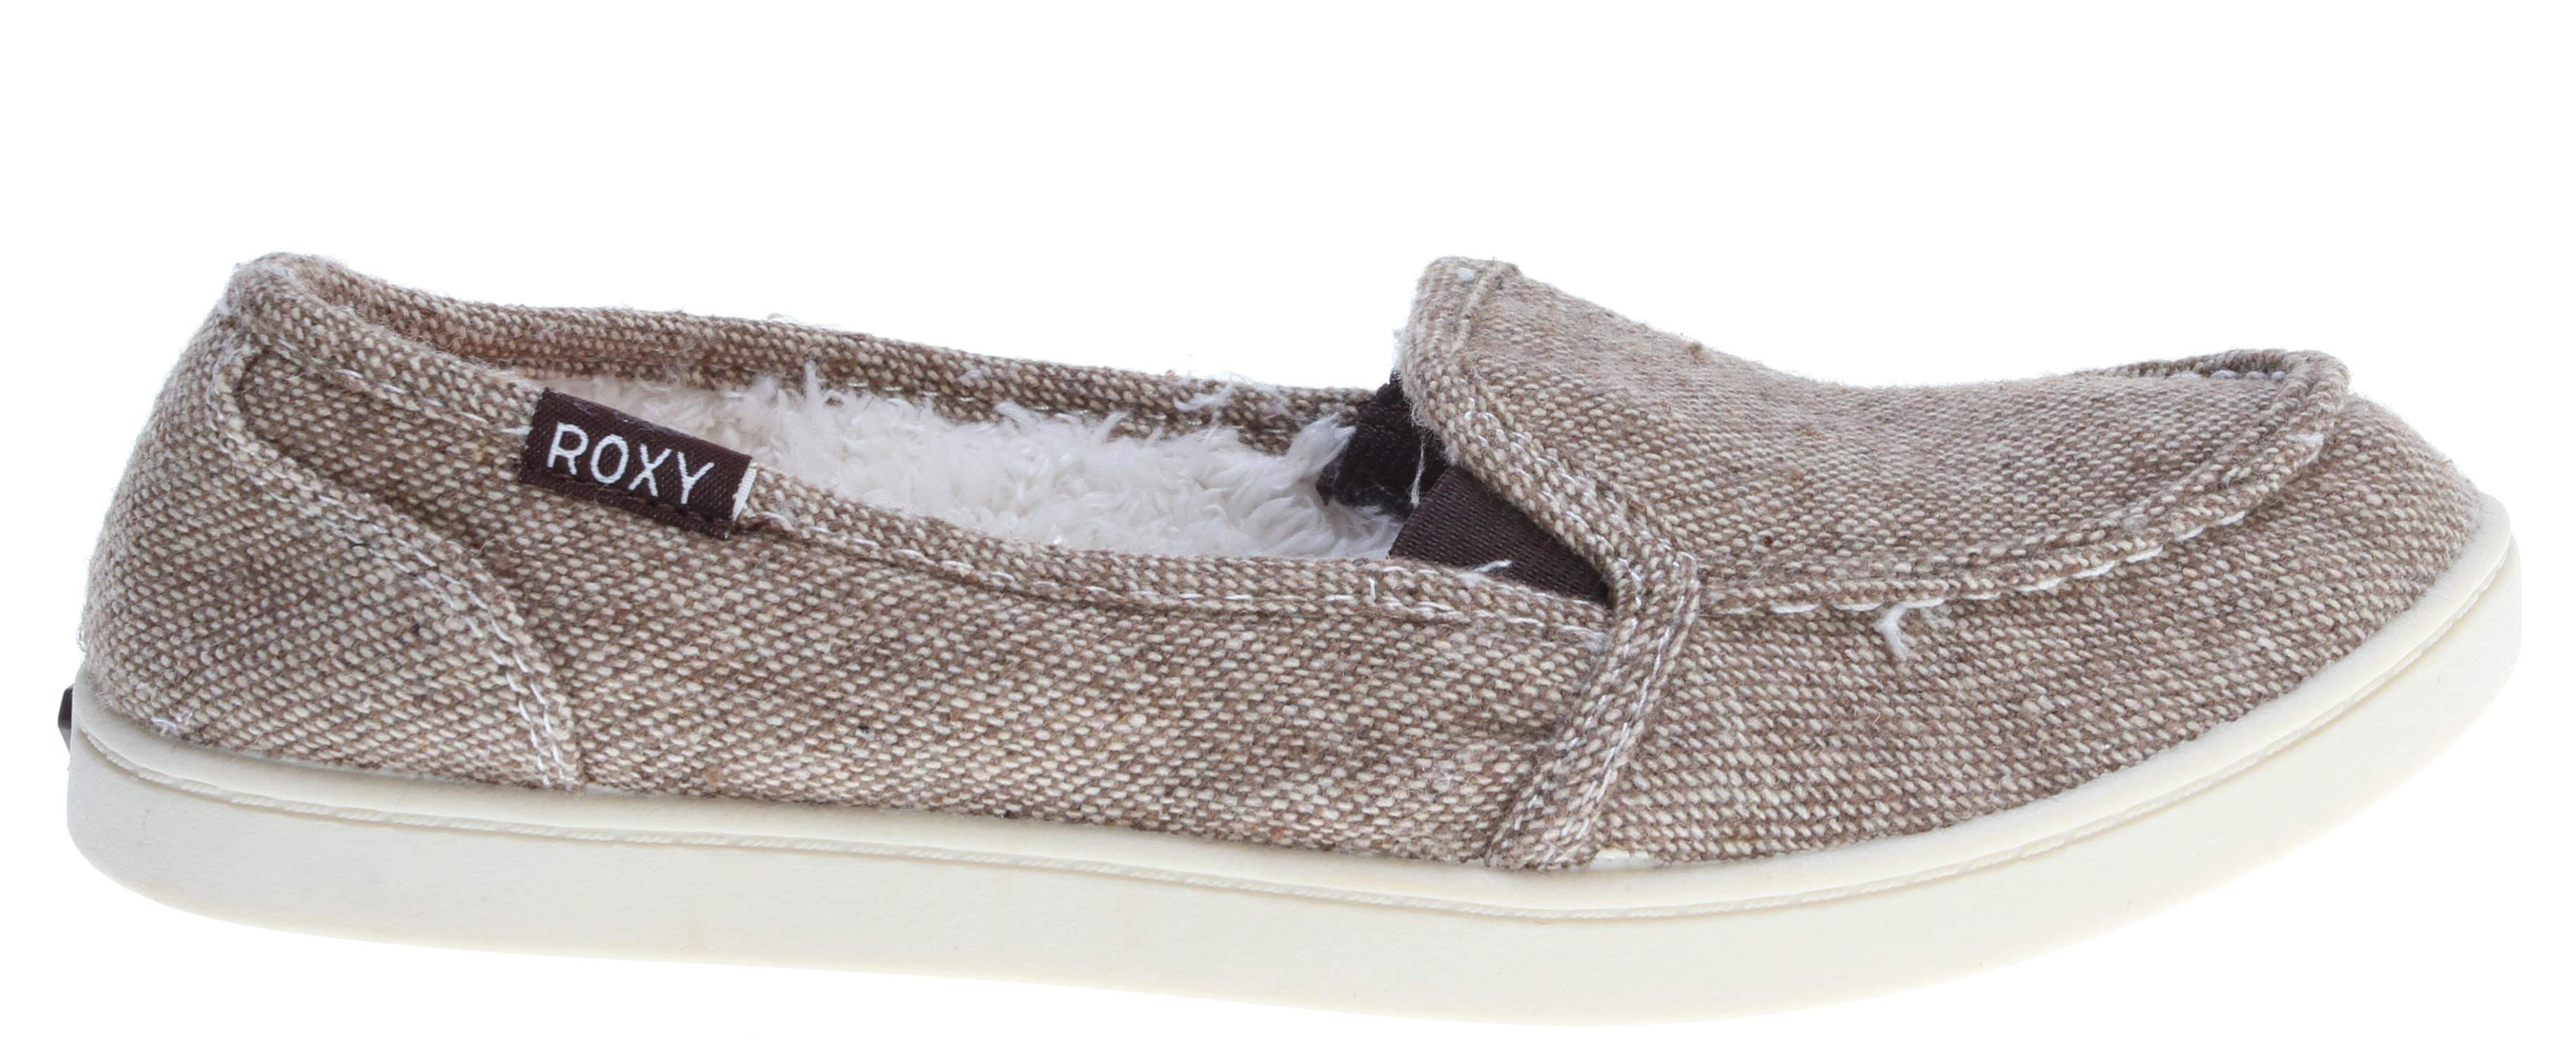 Roxy Lido Wool Womens Shoes